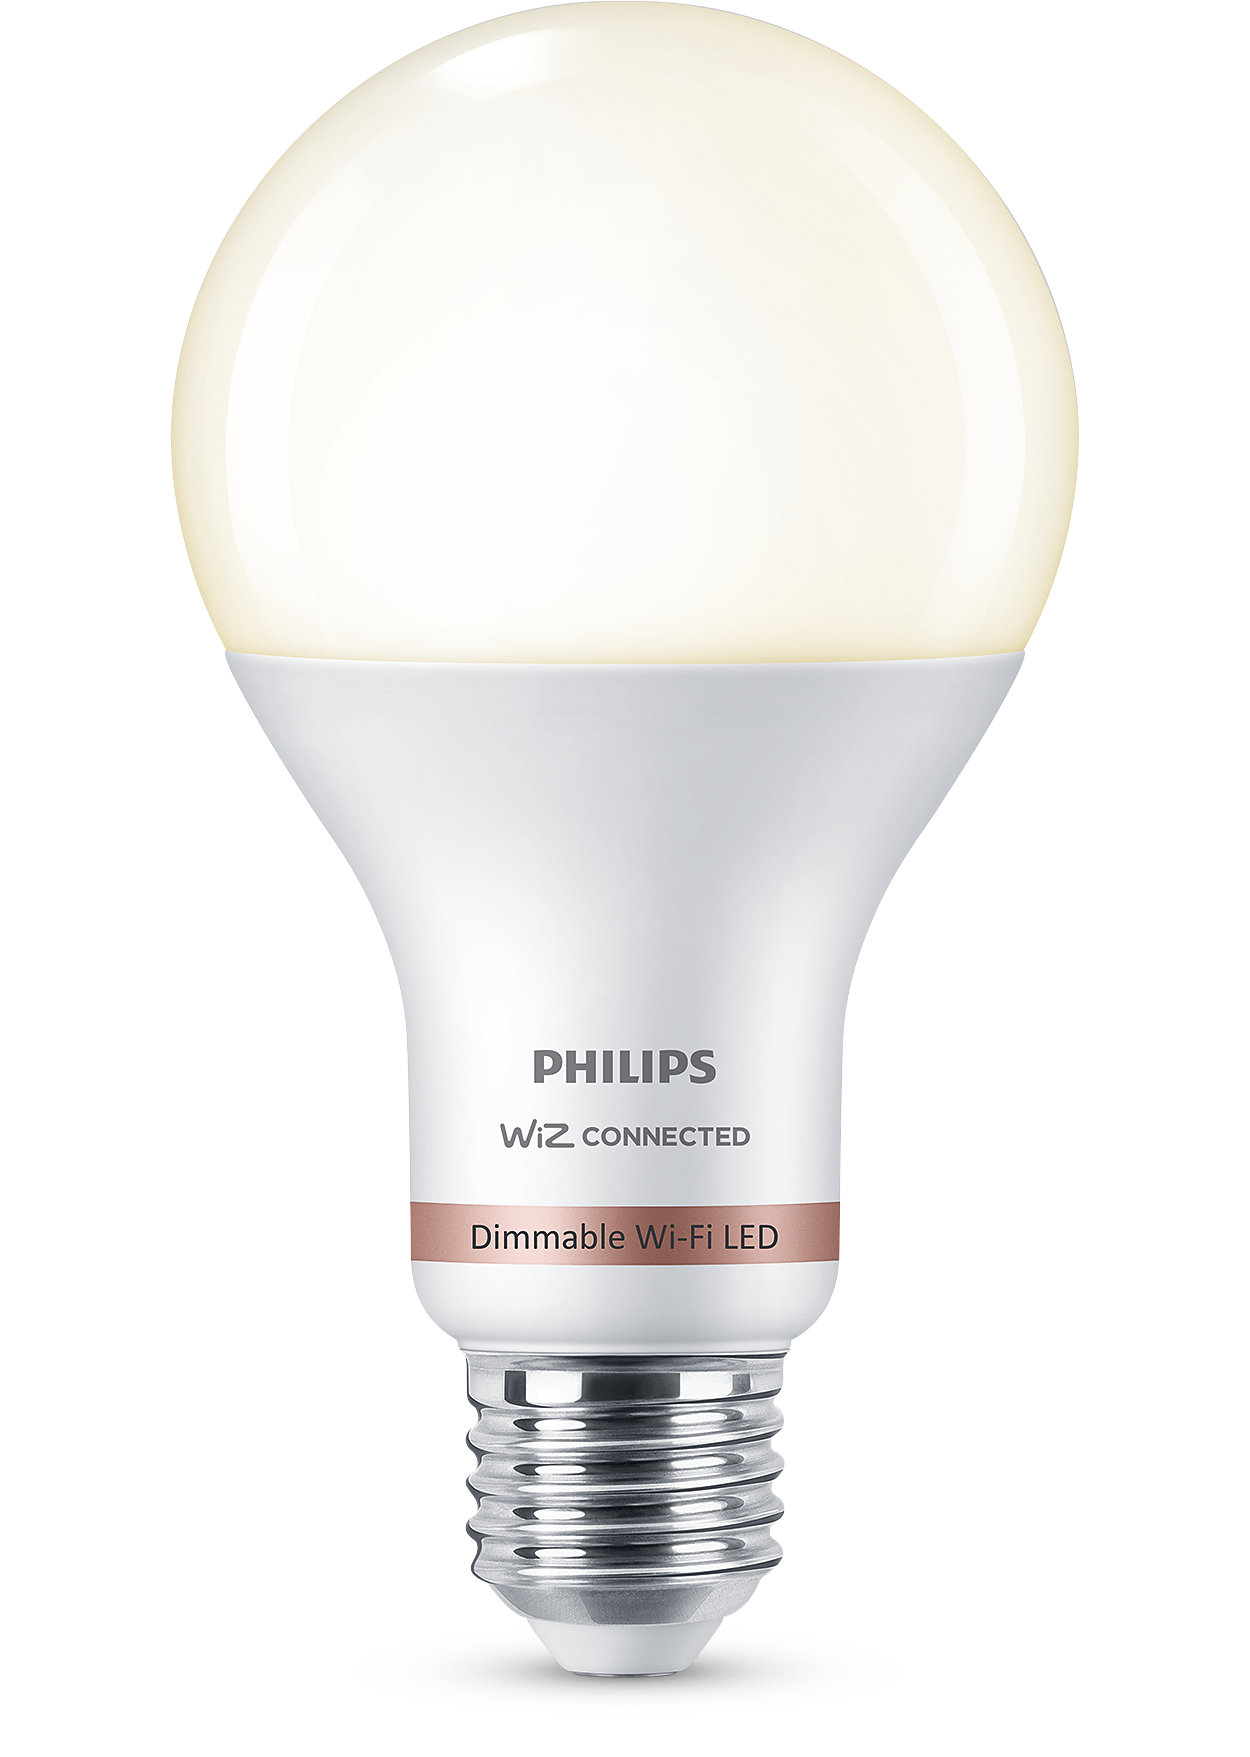 Luz inteligente para tu vida diaria